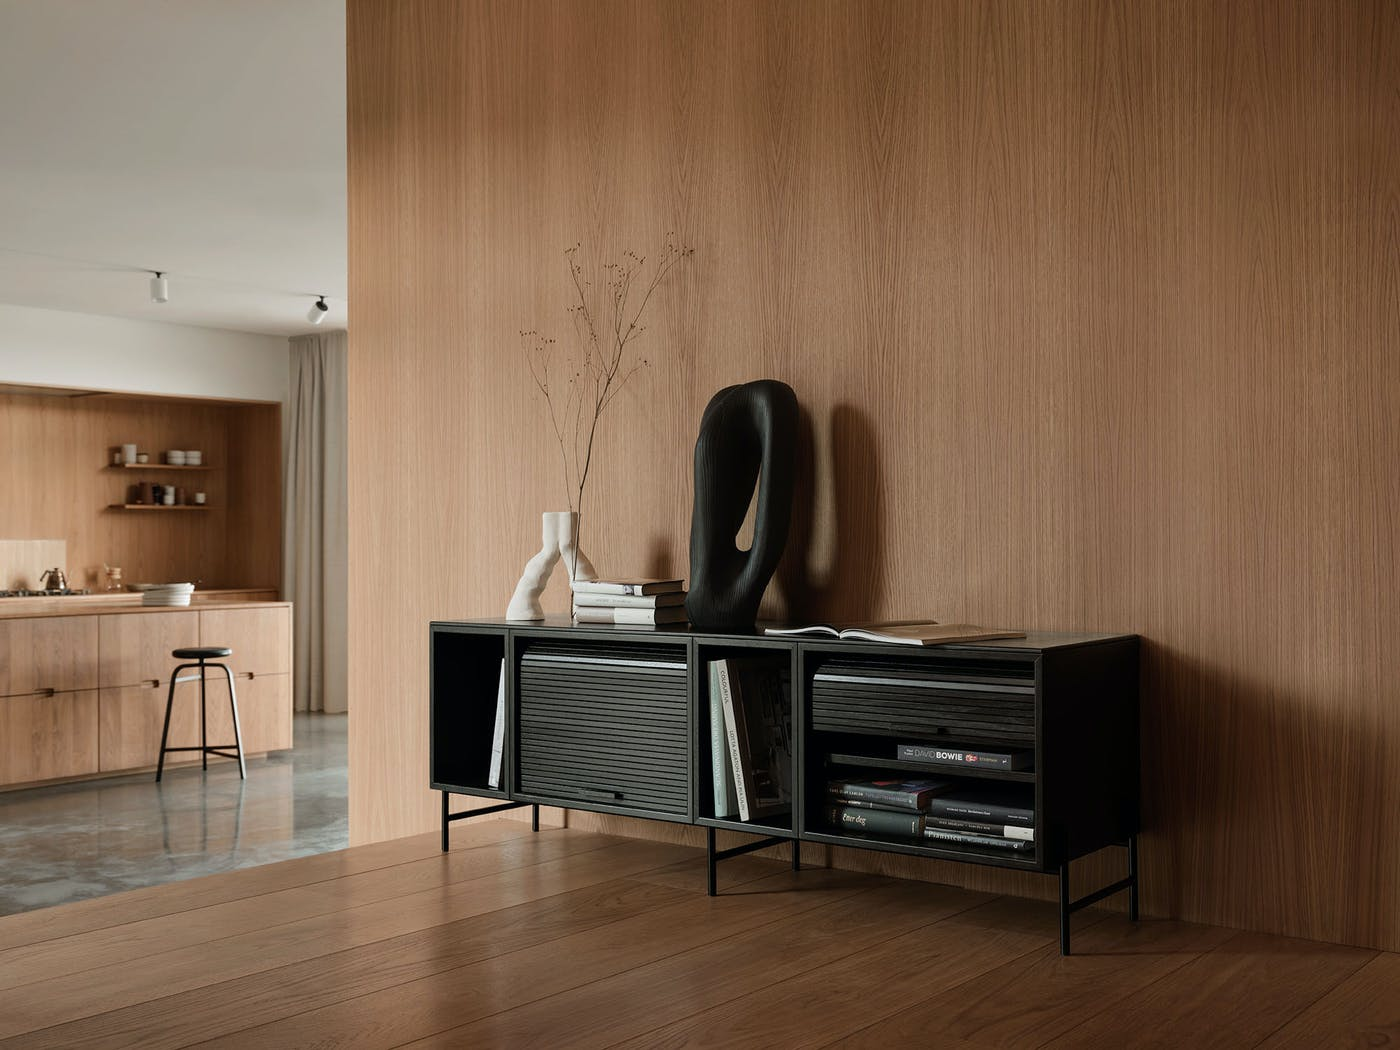 Hifive cabinet 150 black livingroom Northern Photo Einar Aslaksen Low res